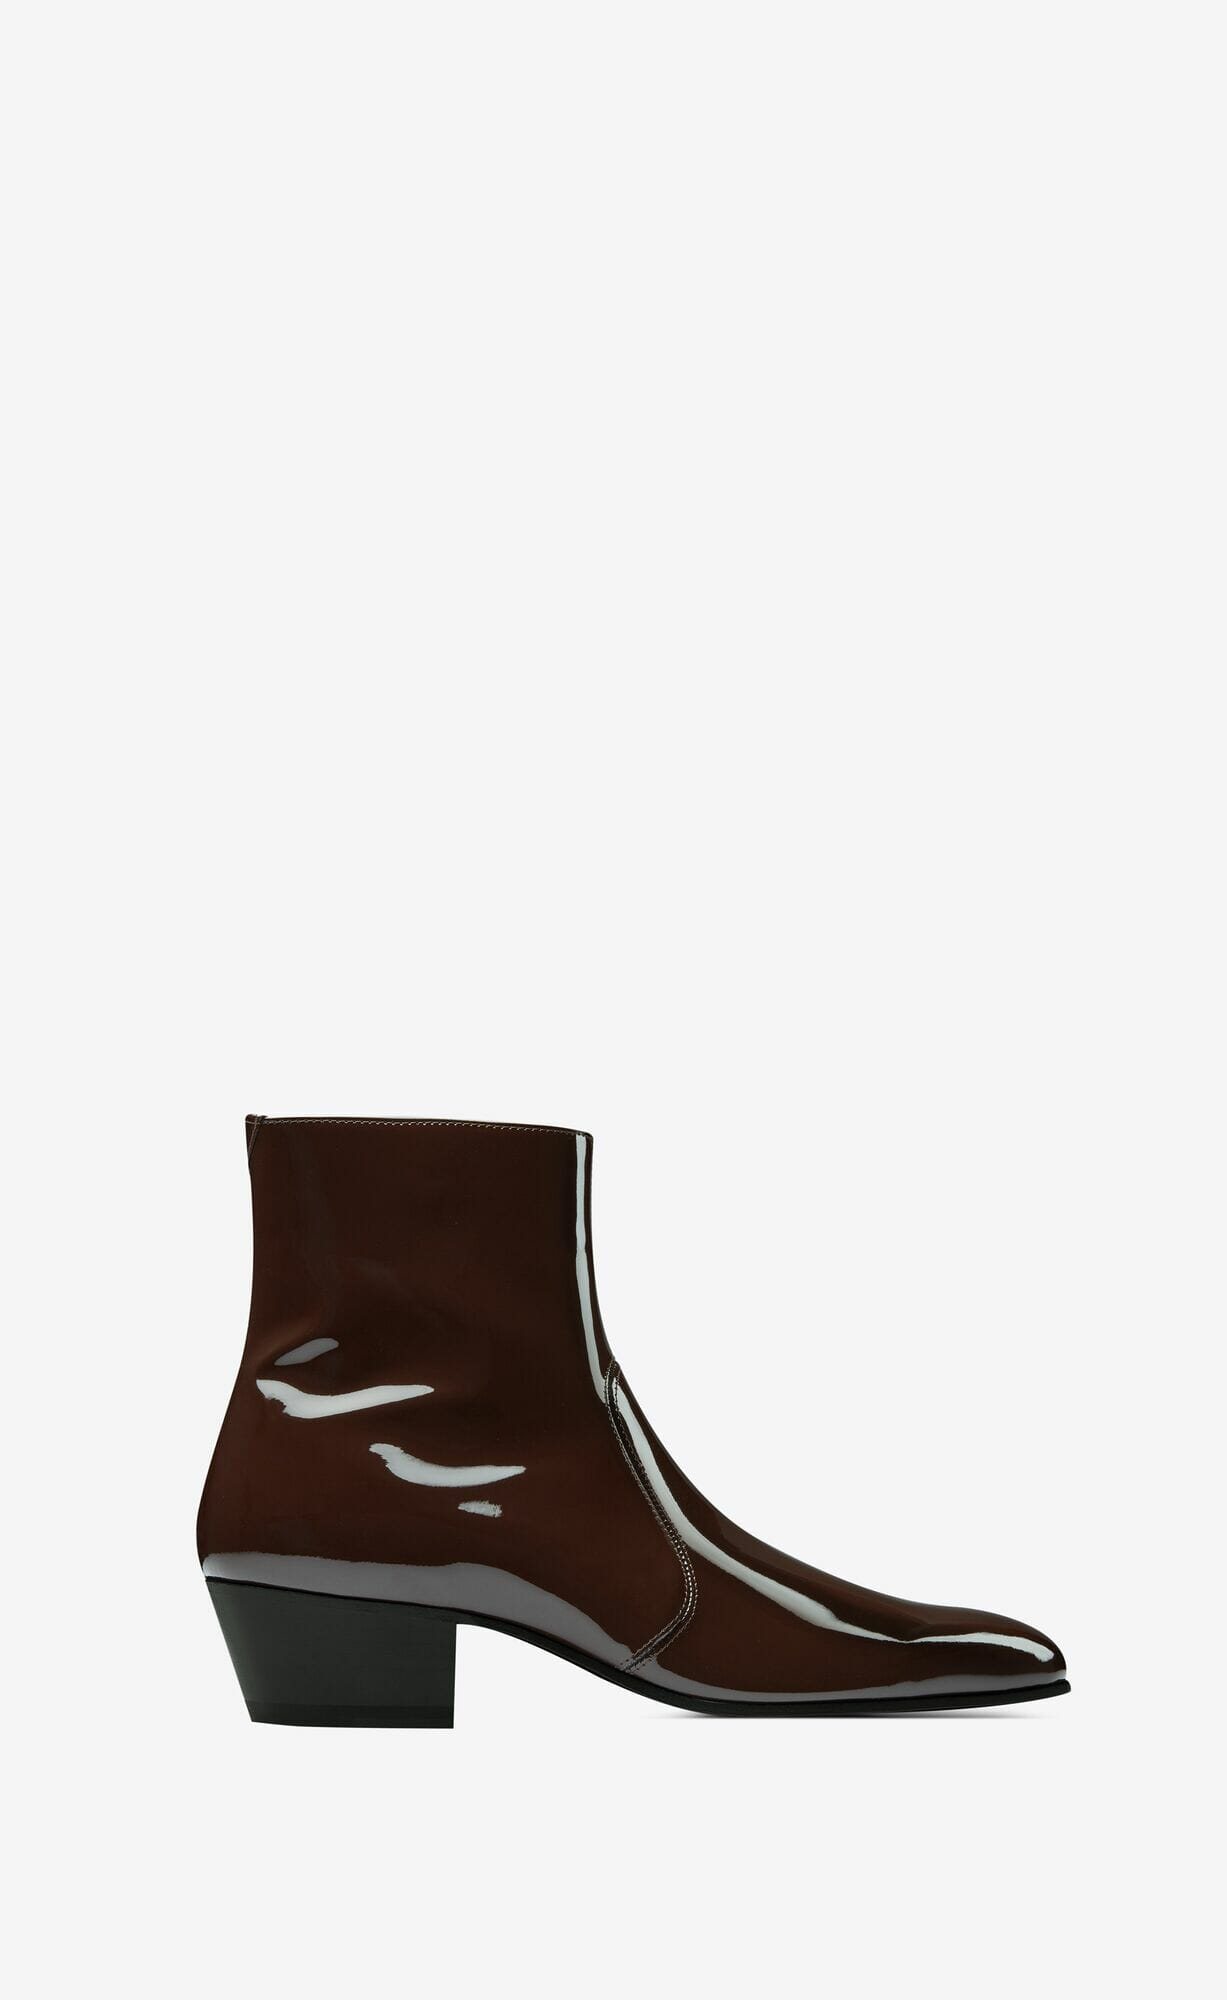 grandma shoe trend fall winter 2019 menswear